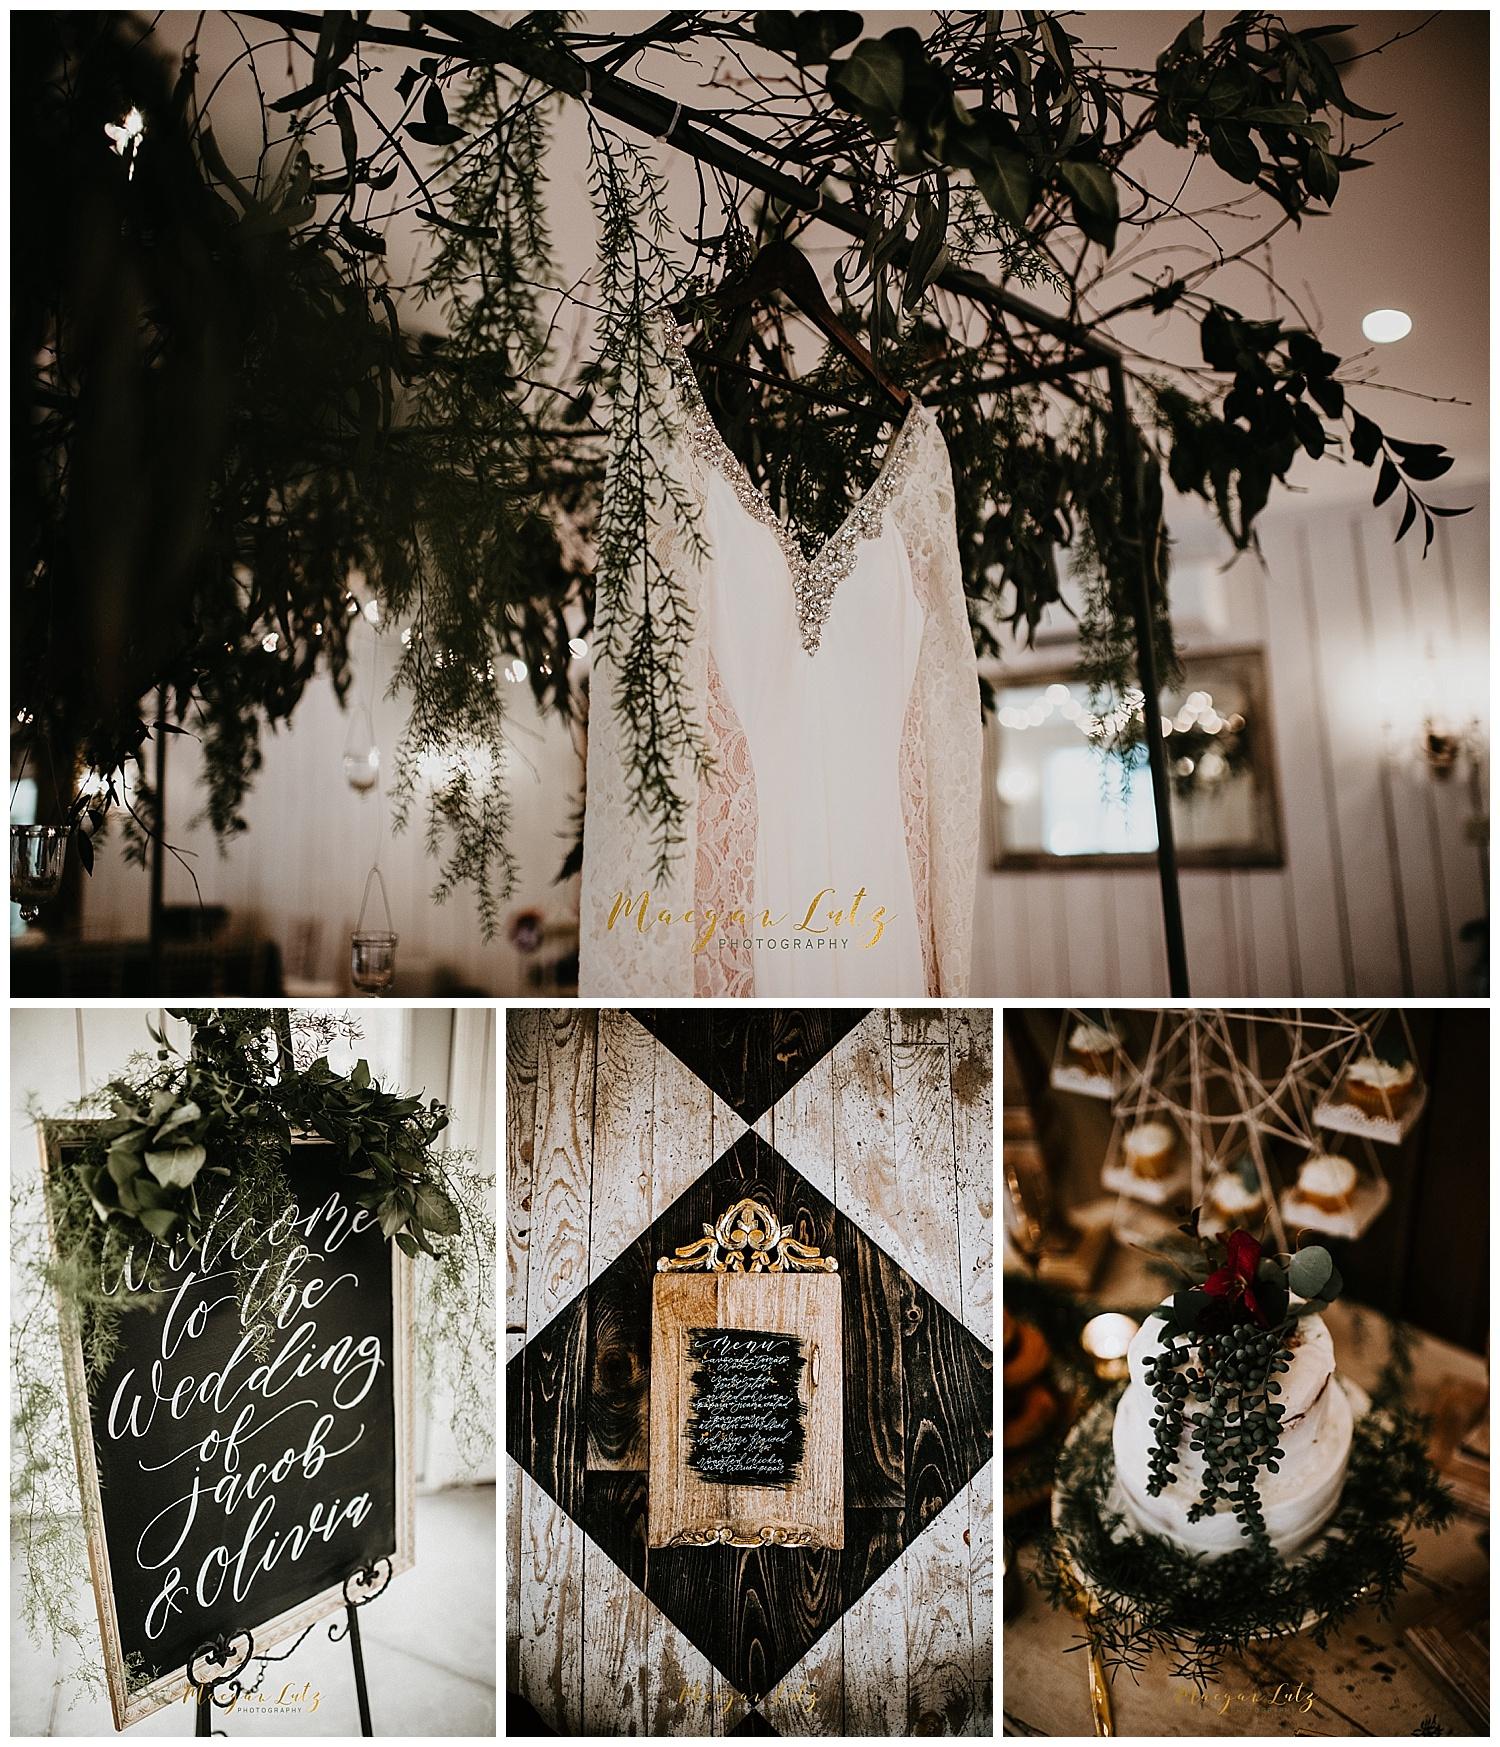 NEPA-wedding-engagement-photographer-whitewoods-weddings-venue-Wapwallopen-PA_0068.jpg